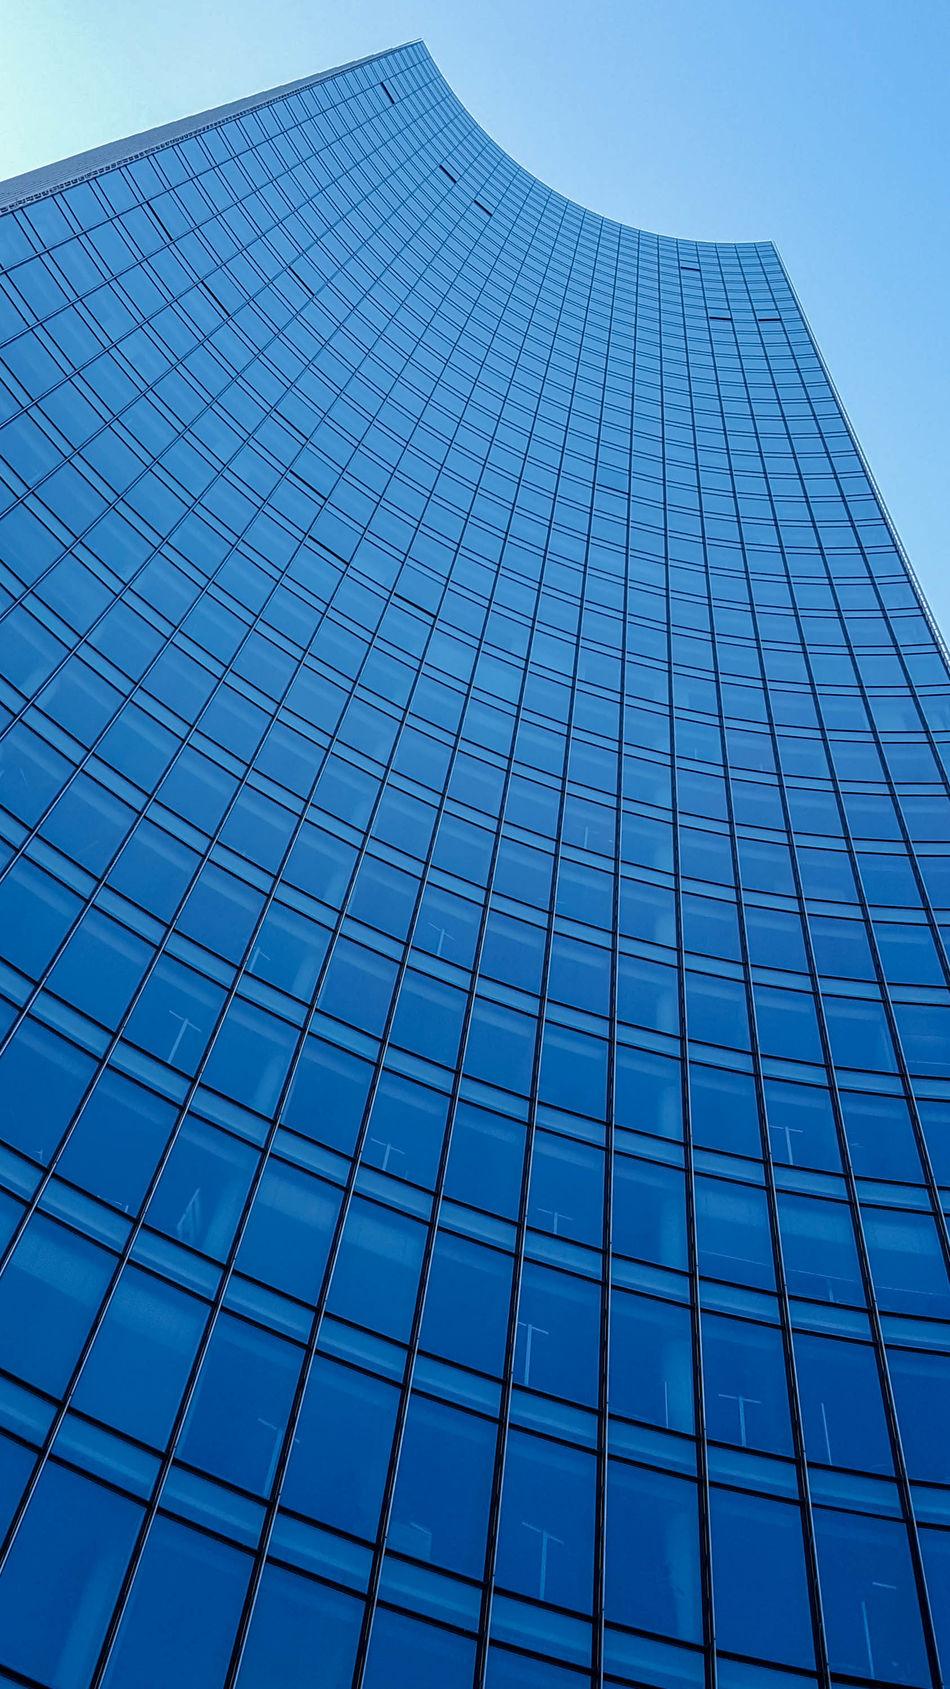 Architecture Bank Bankfurt Building Exterior Built Structure City Clear Sky Day EyeEm Frankfurt Frankfurt Am Main Hochhaus Low Angle View Modern No People Outdoors Pupparazzi Skyline Skyline Frankfurt Skyscraper Windows Minimalist Architecture